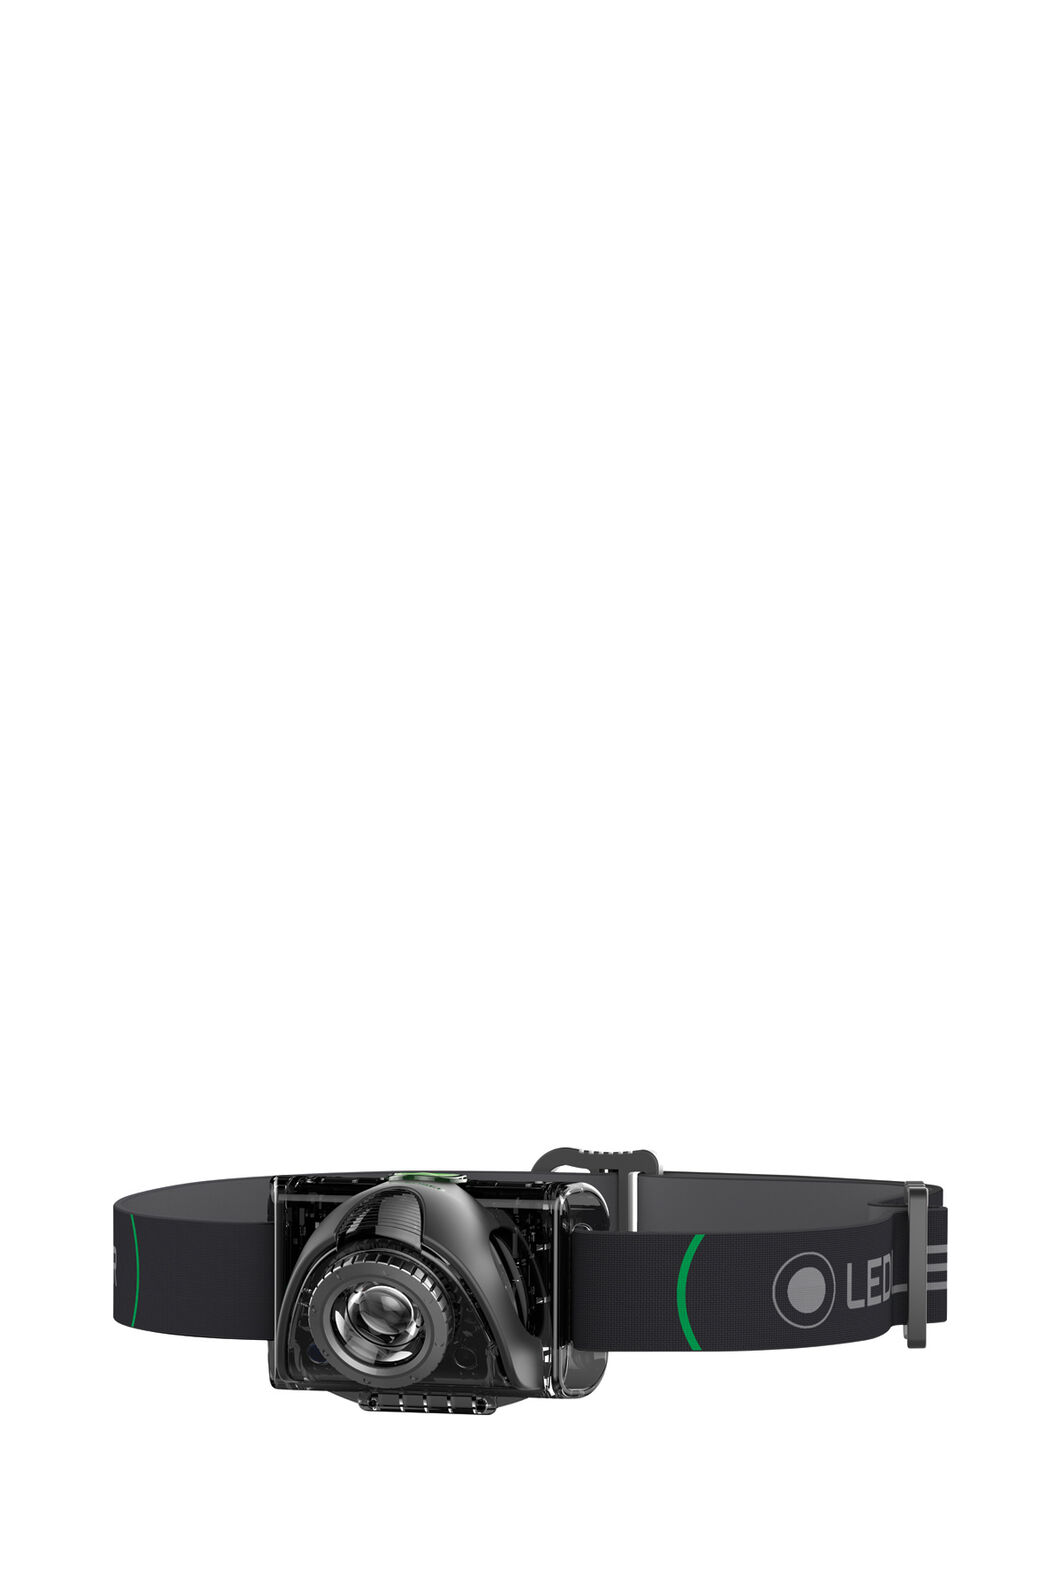 Led Lenser Outdoor Series MH6 Headlamp, None, hi-res